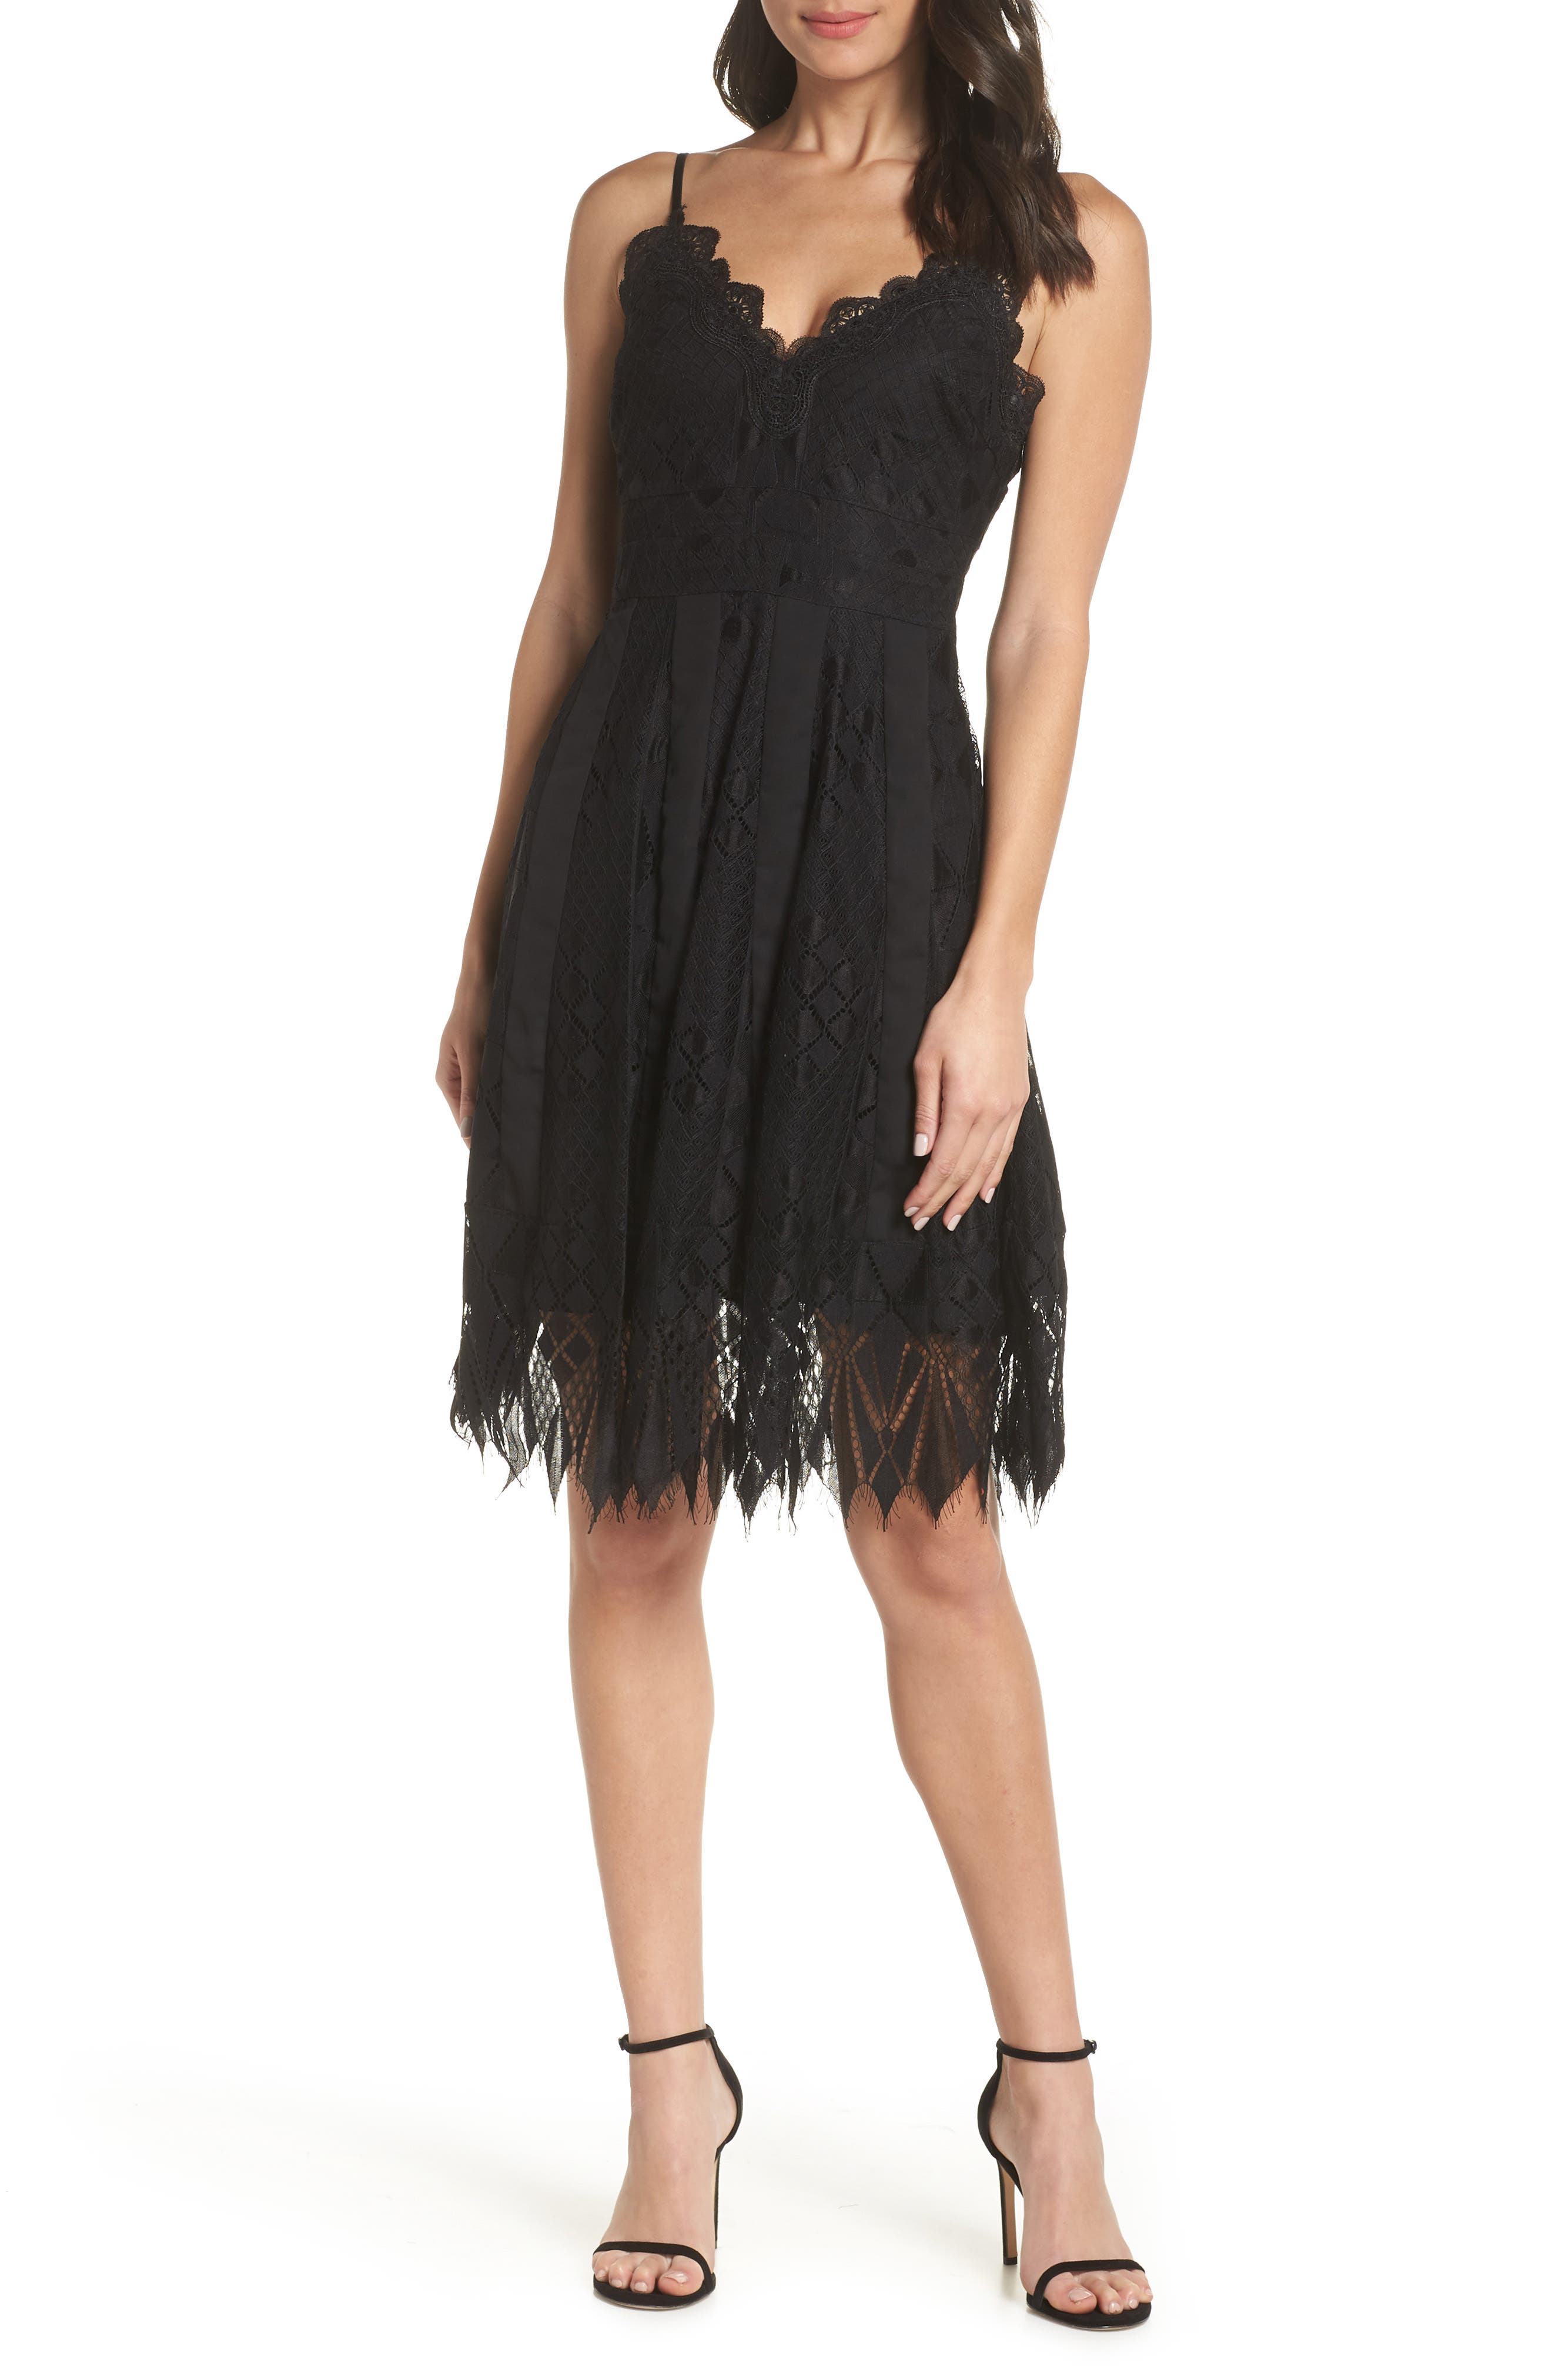 FOXIEDOX, Calla Geometric Lace Dress, Main thumbnail 1, color, 001